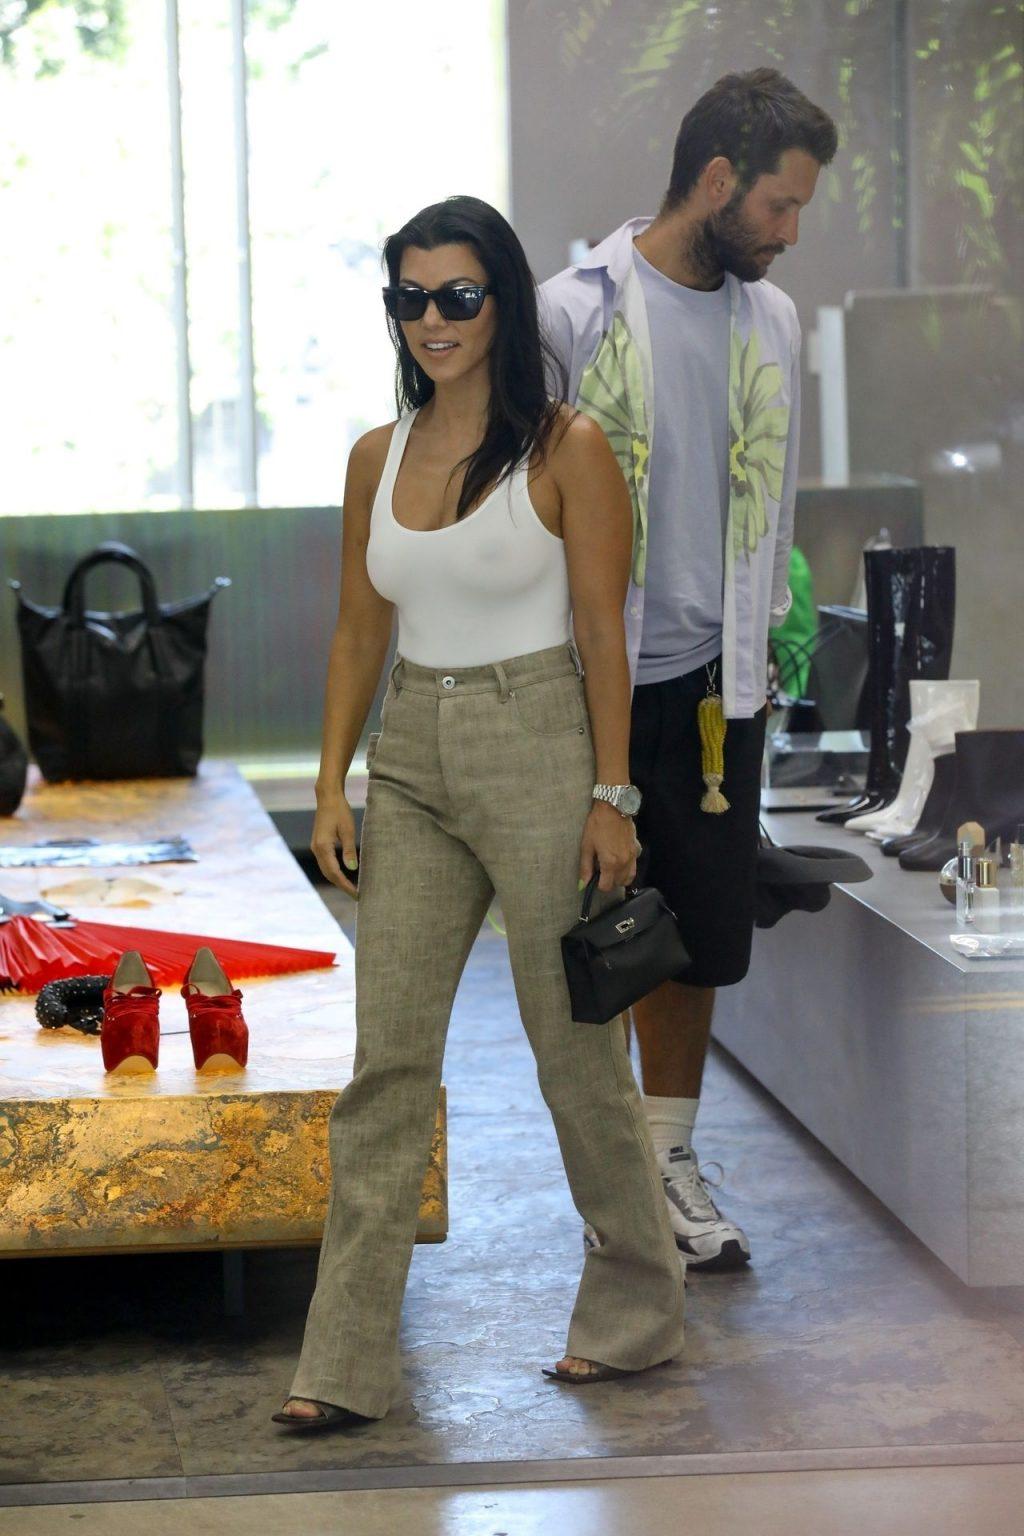 Kourtney Kardashian See Through Thefappeningblog Com 141 102